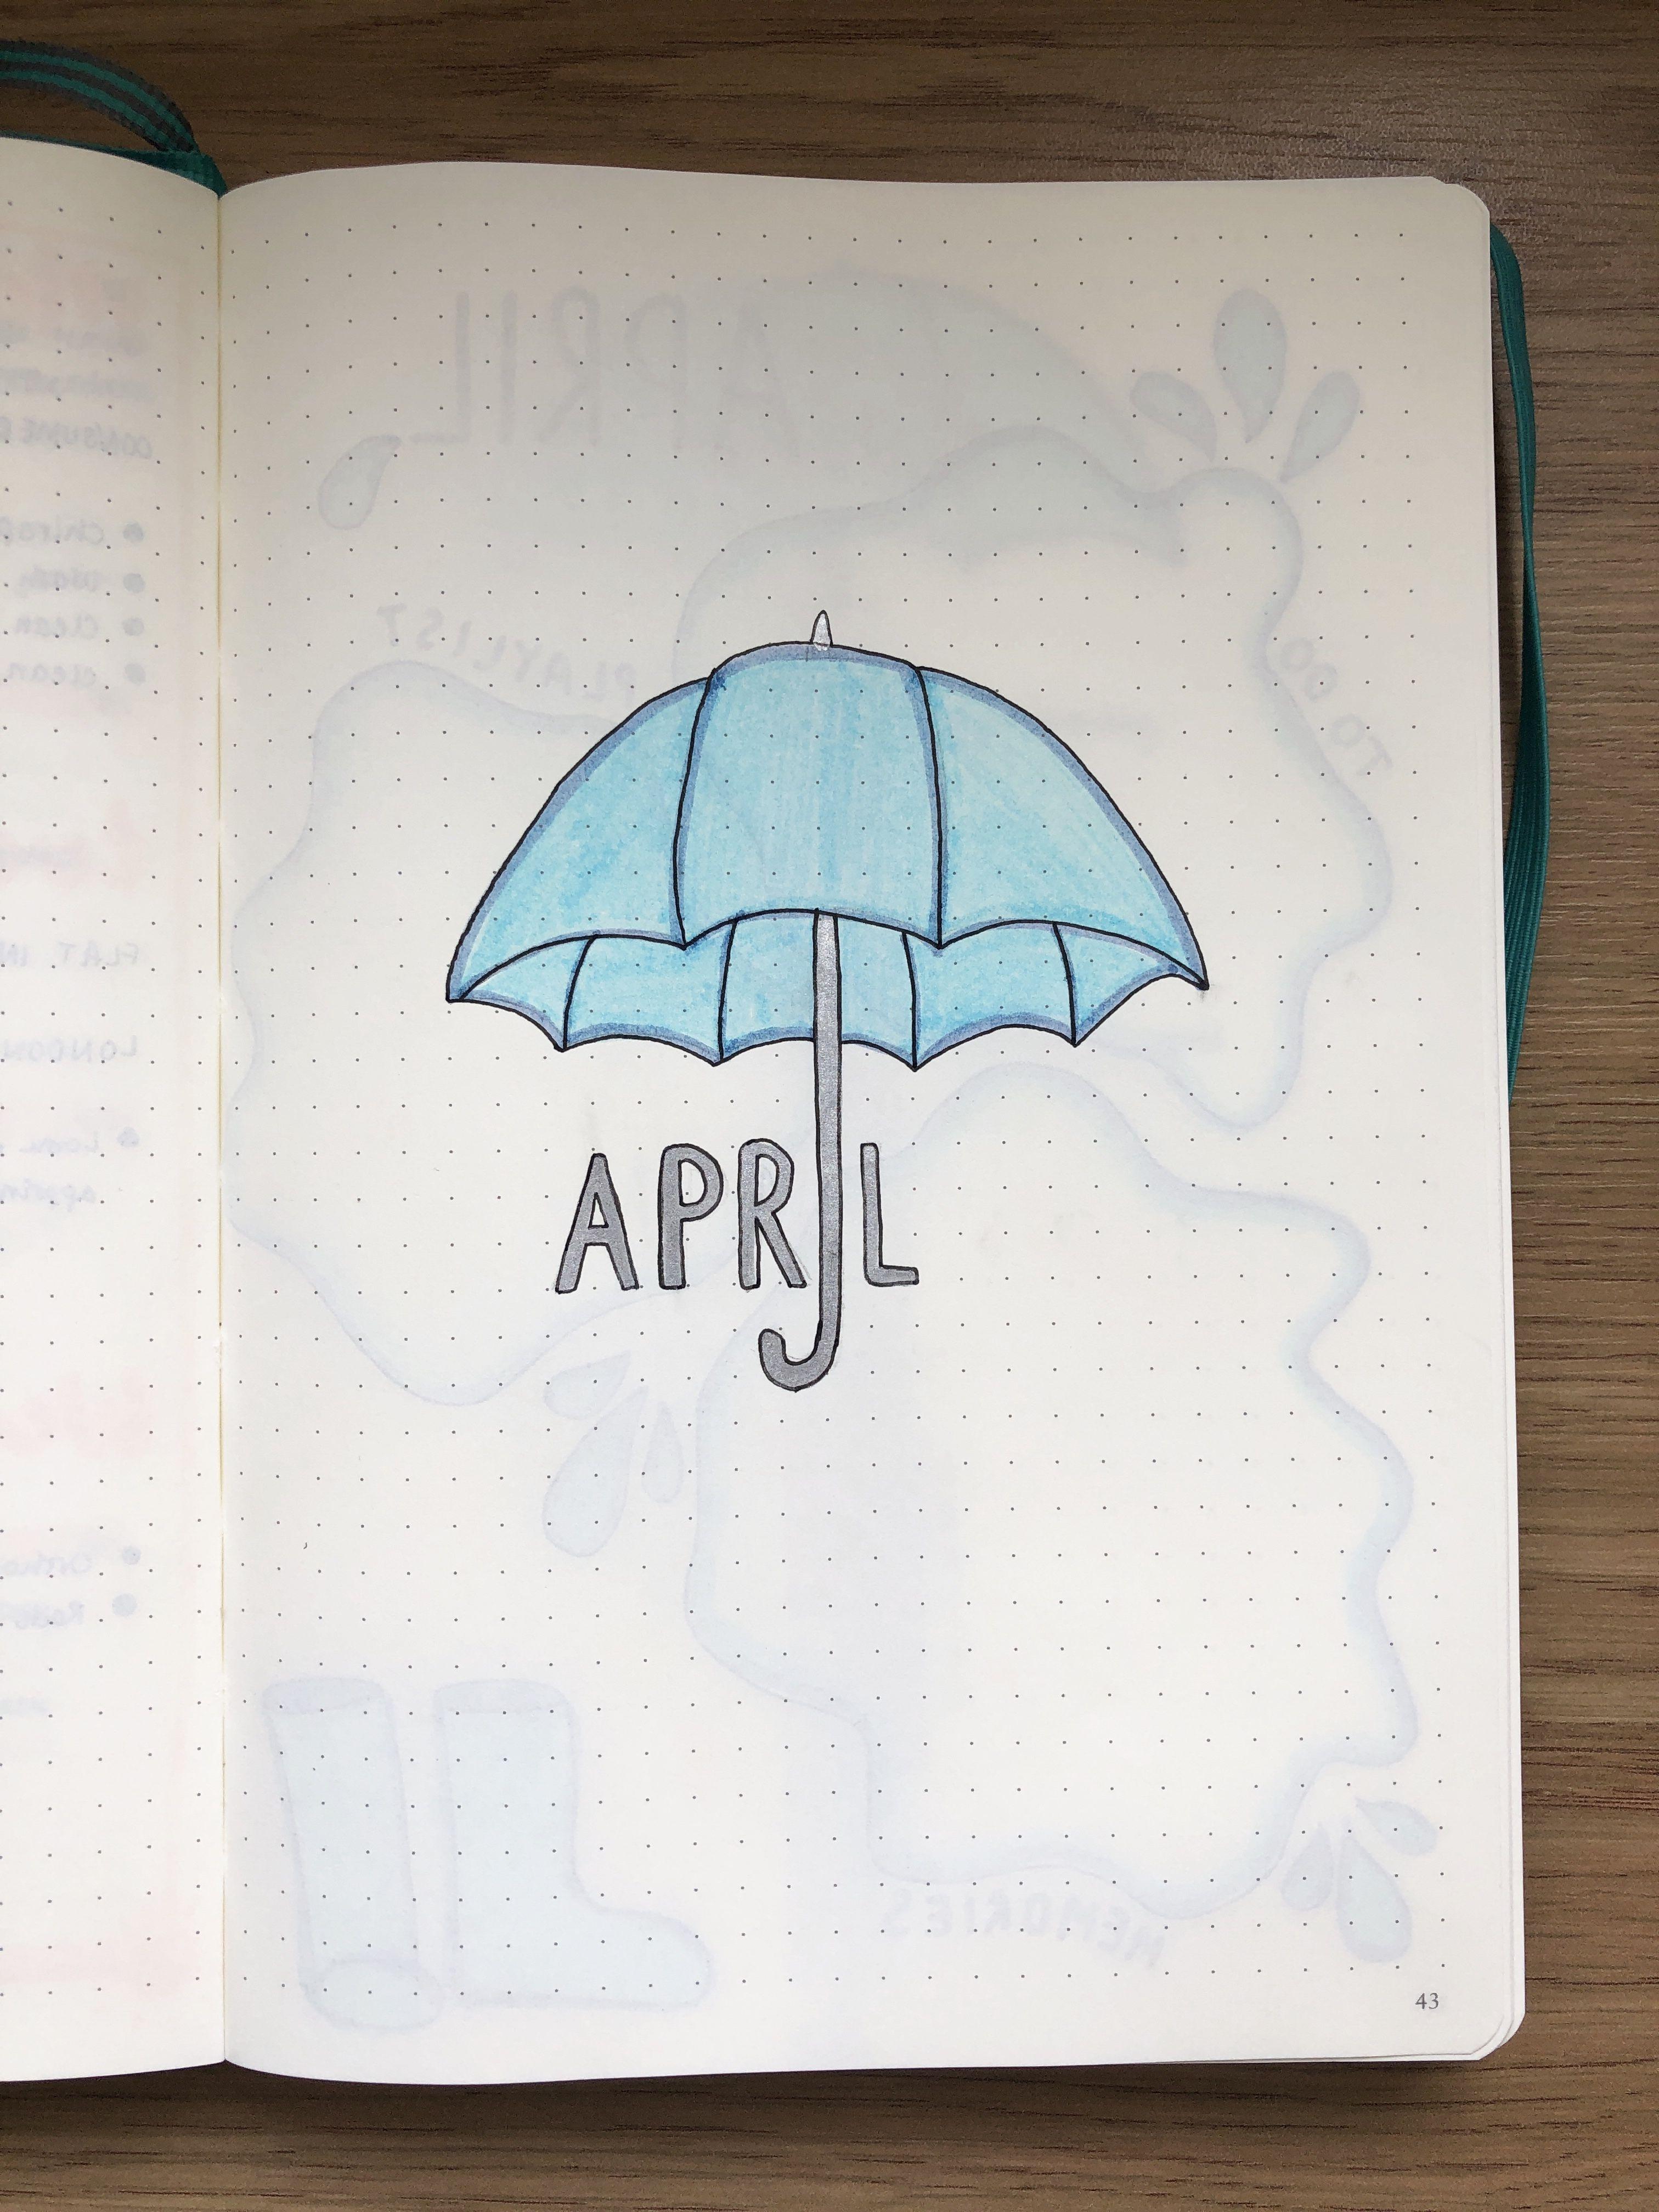 april • bullet journal • cover • rain • umbrella • blue • silver • simple •